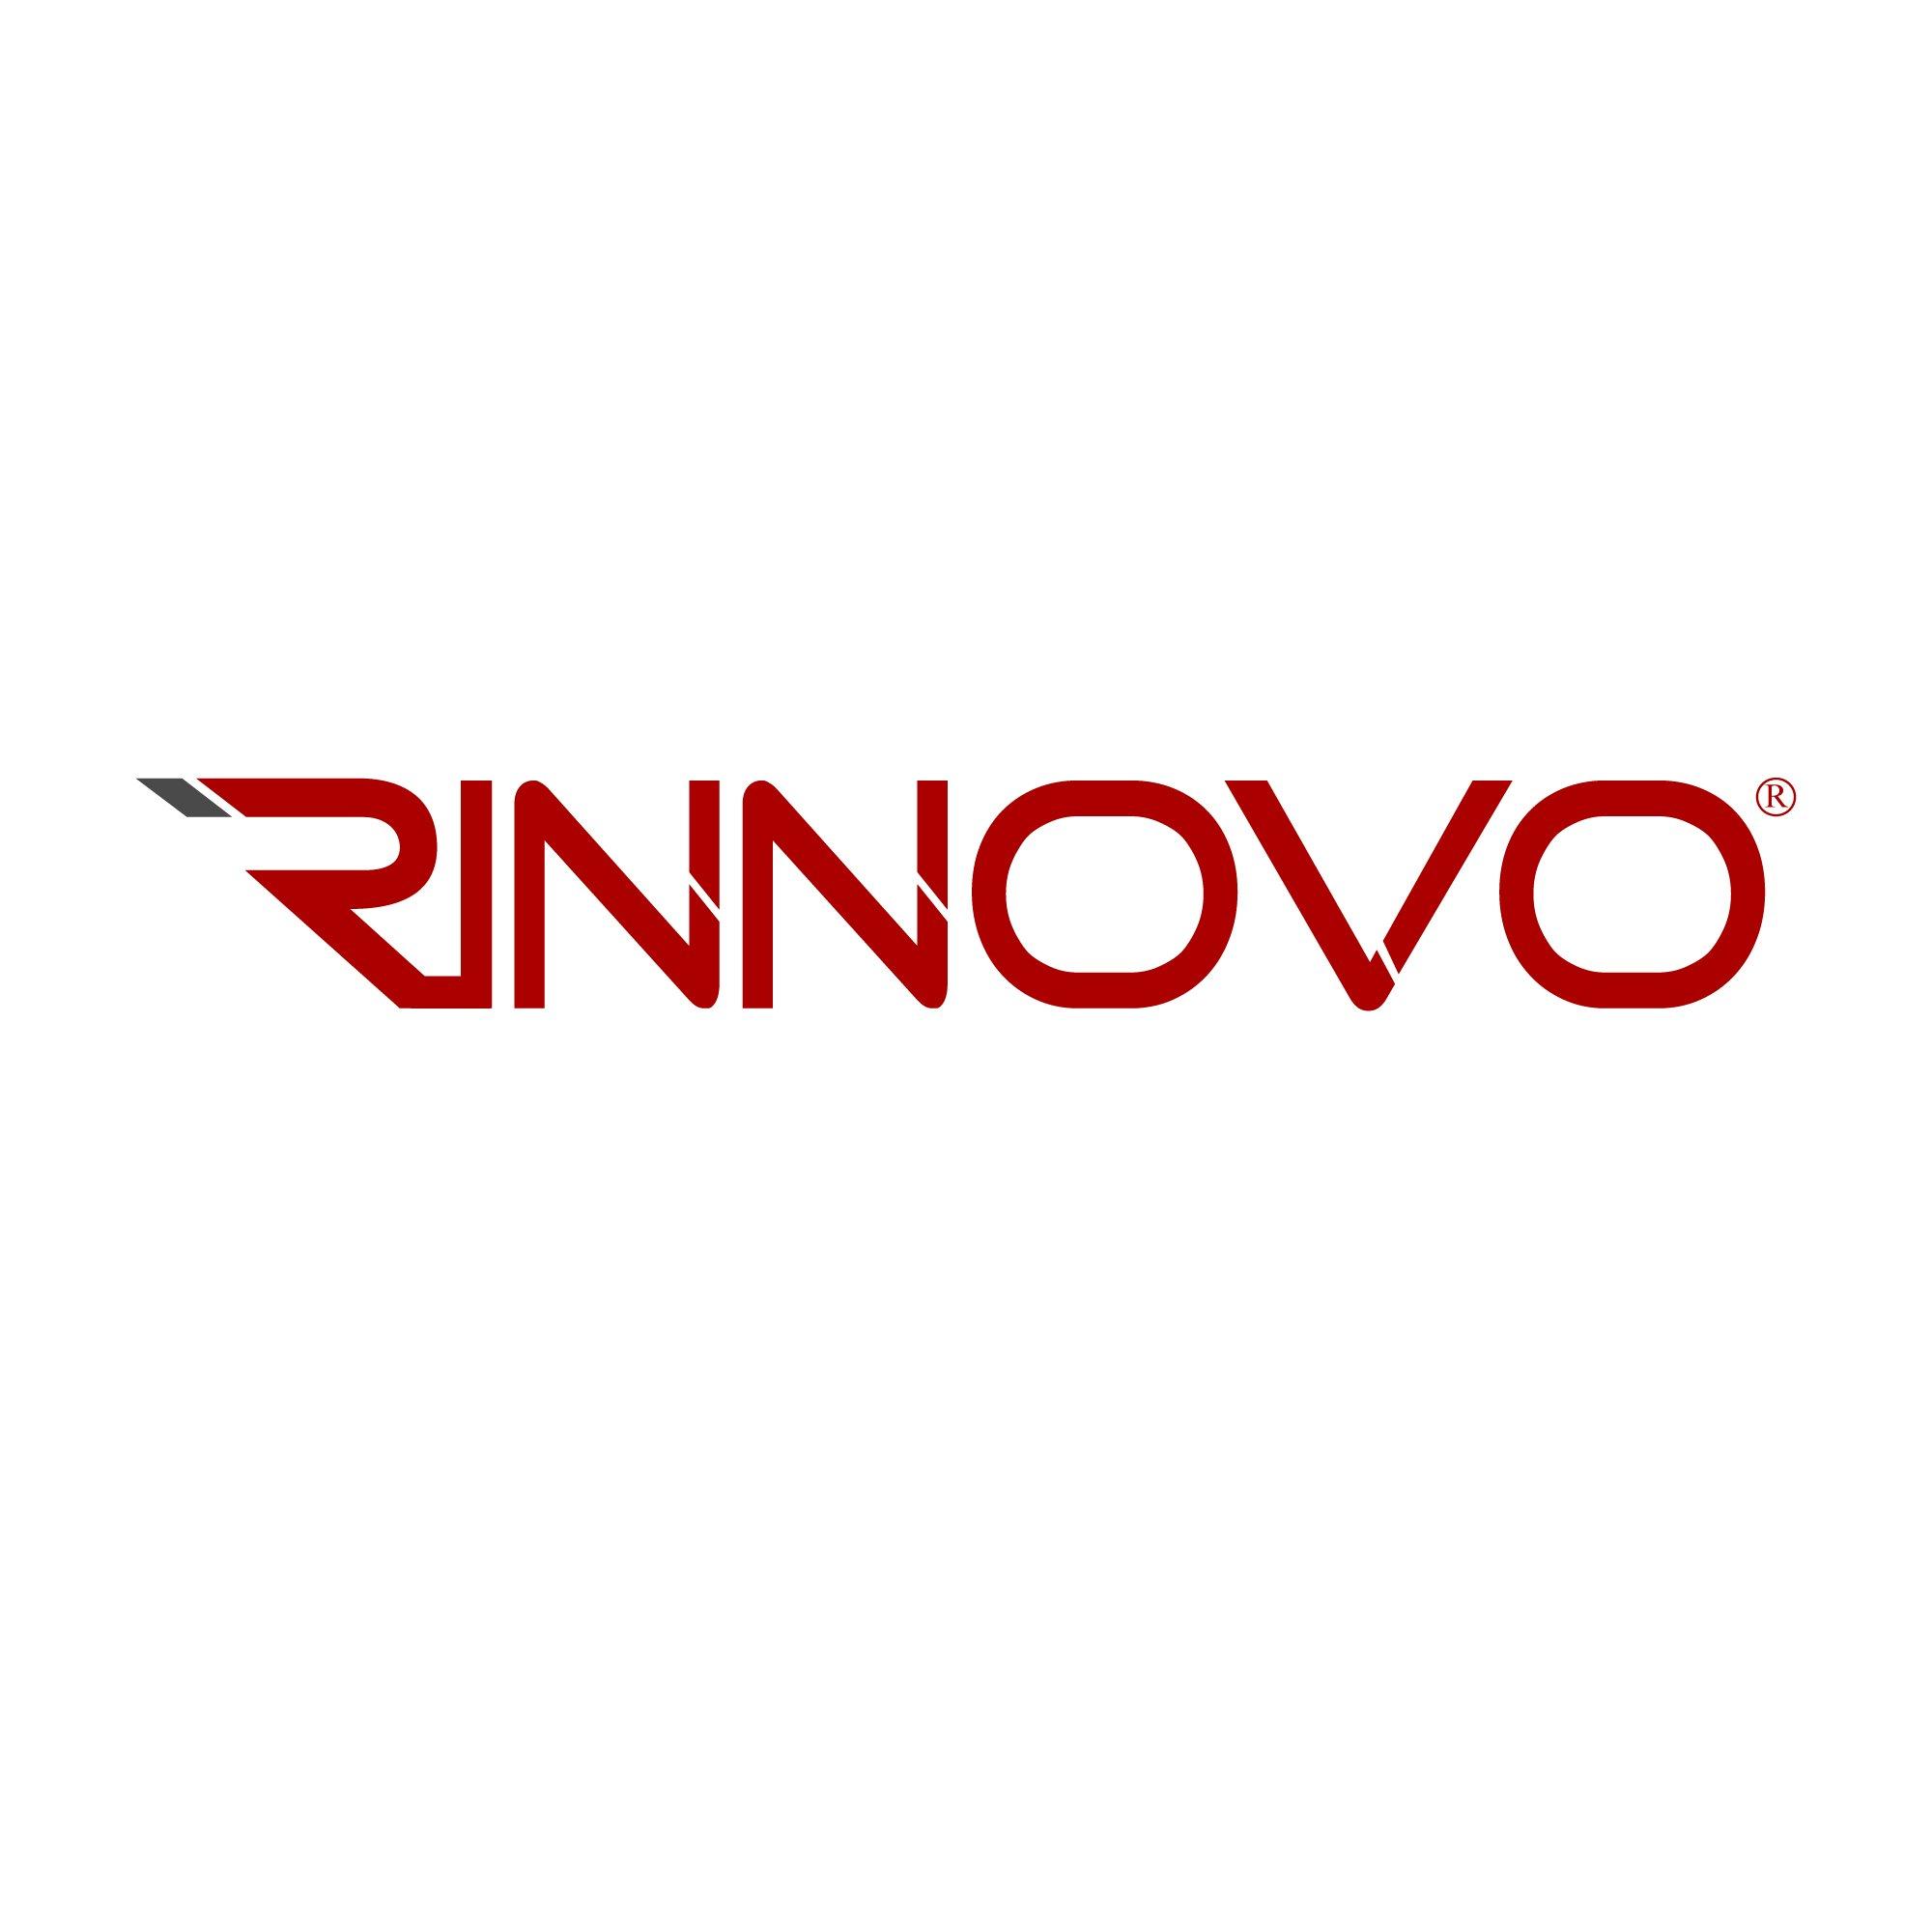 RINNOVO on Twitter: